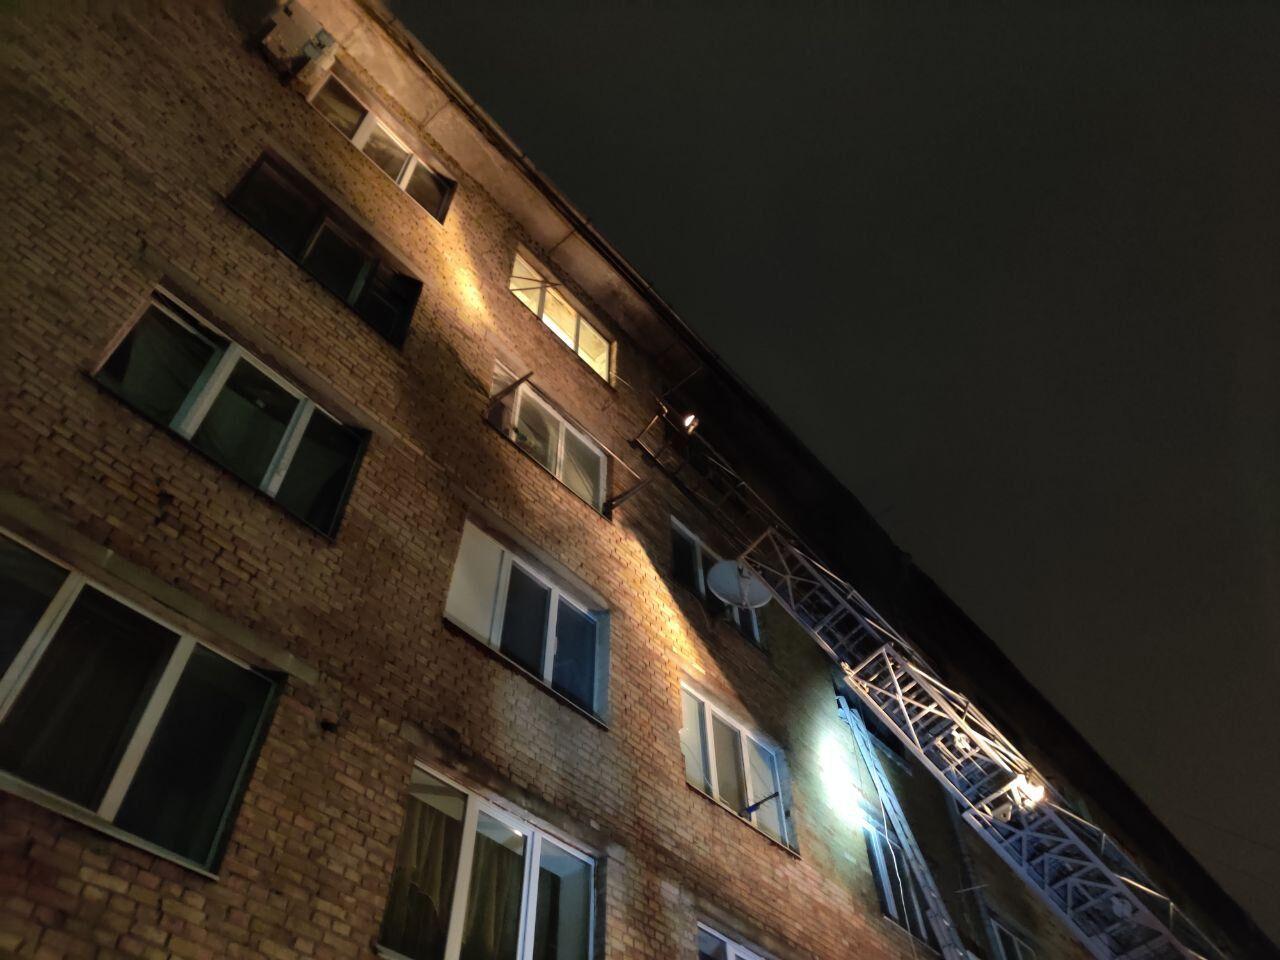 У Києві трапилася пожежа в житловому будинку